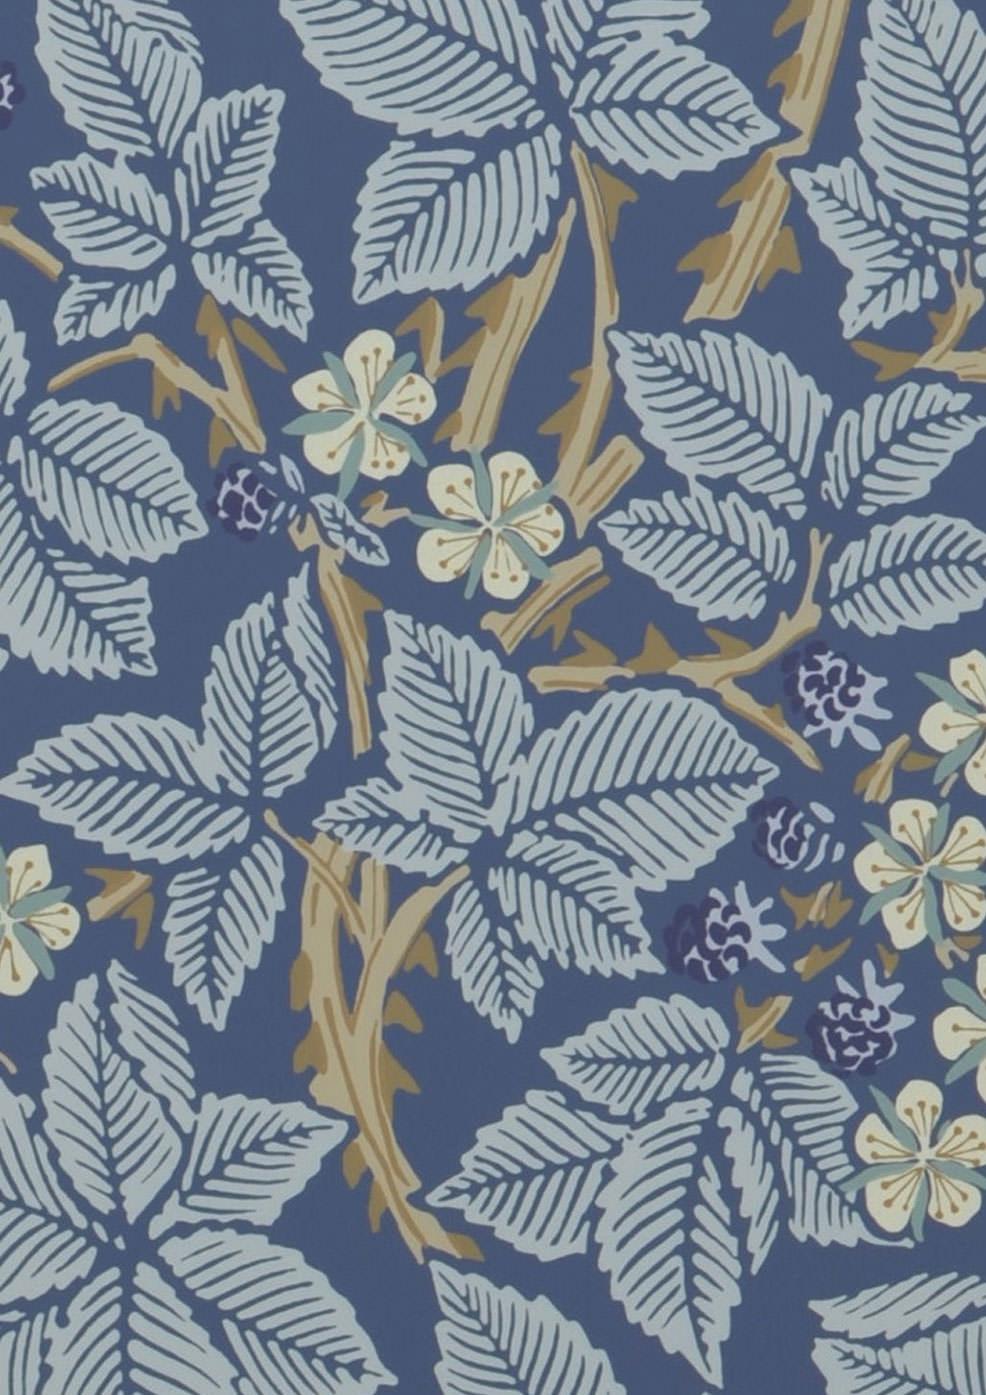 Papier peint bleu bleu fonc vert marron ivoire clair bleu pastel pap - Papier peint bleu fonce ...